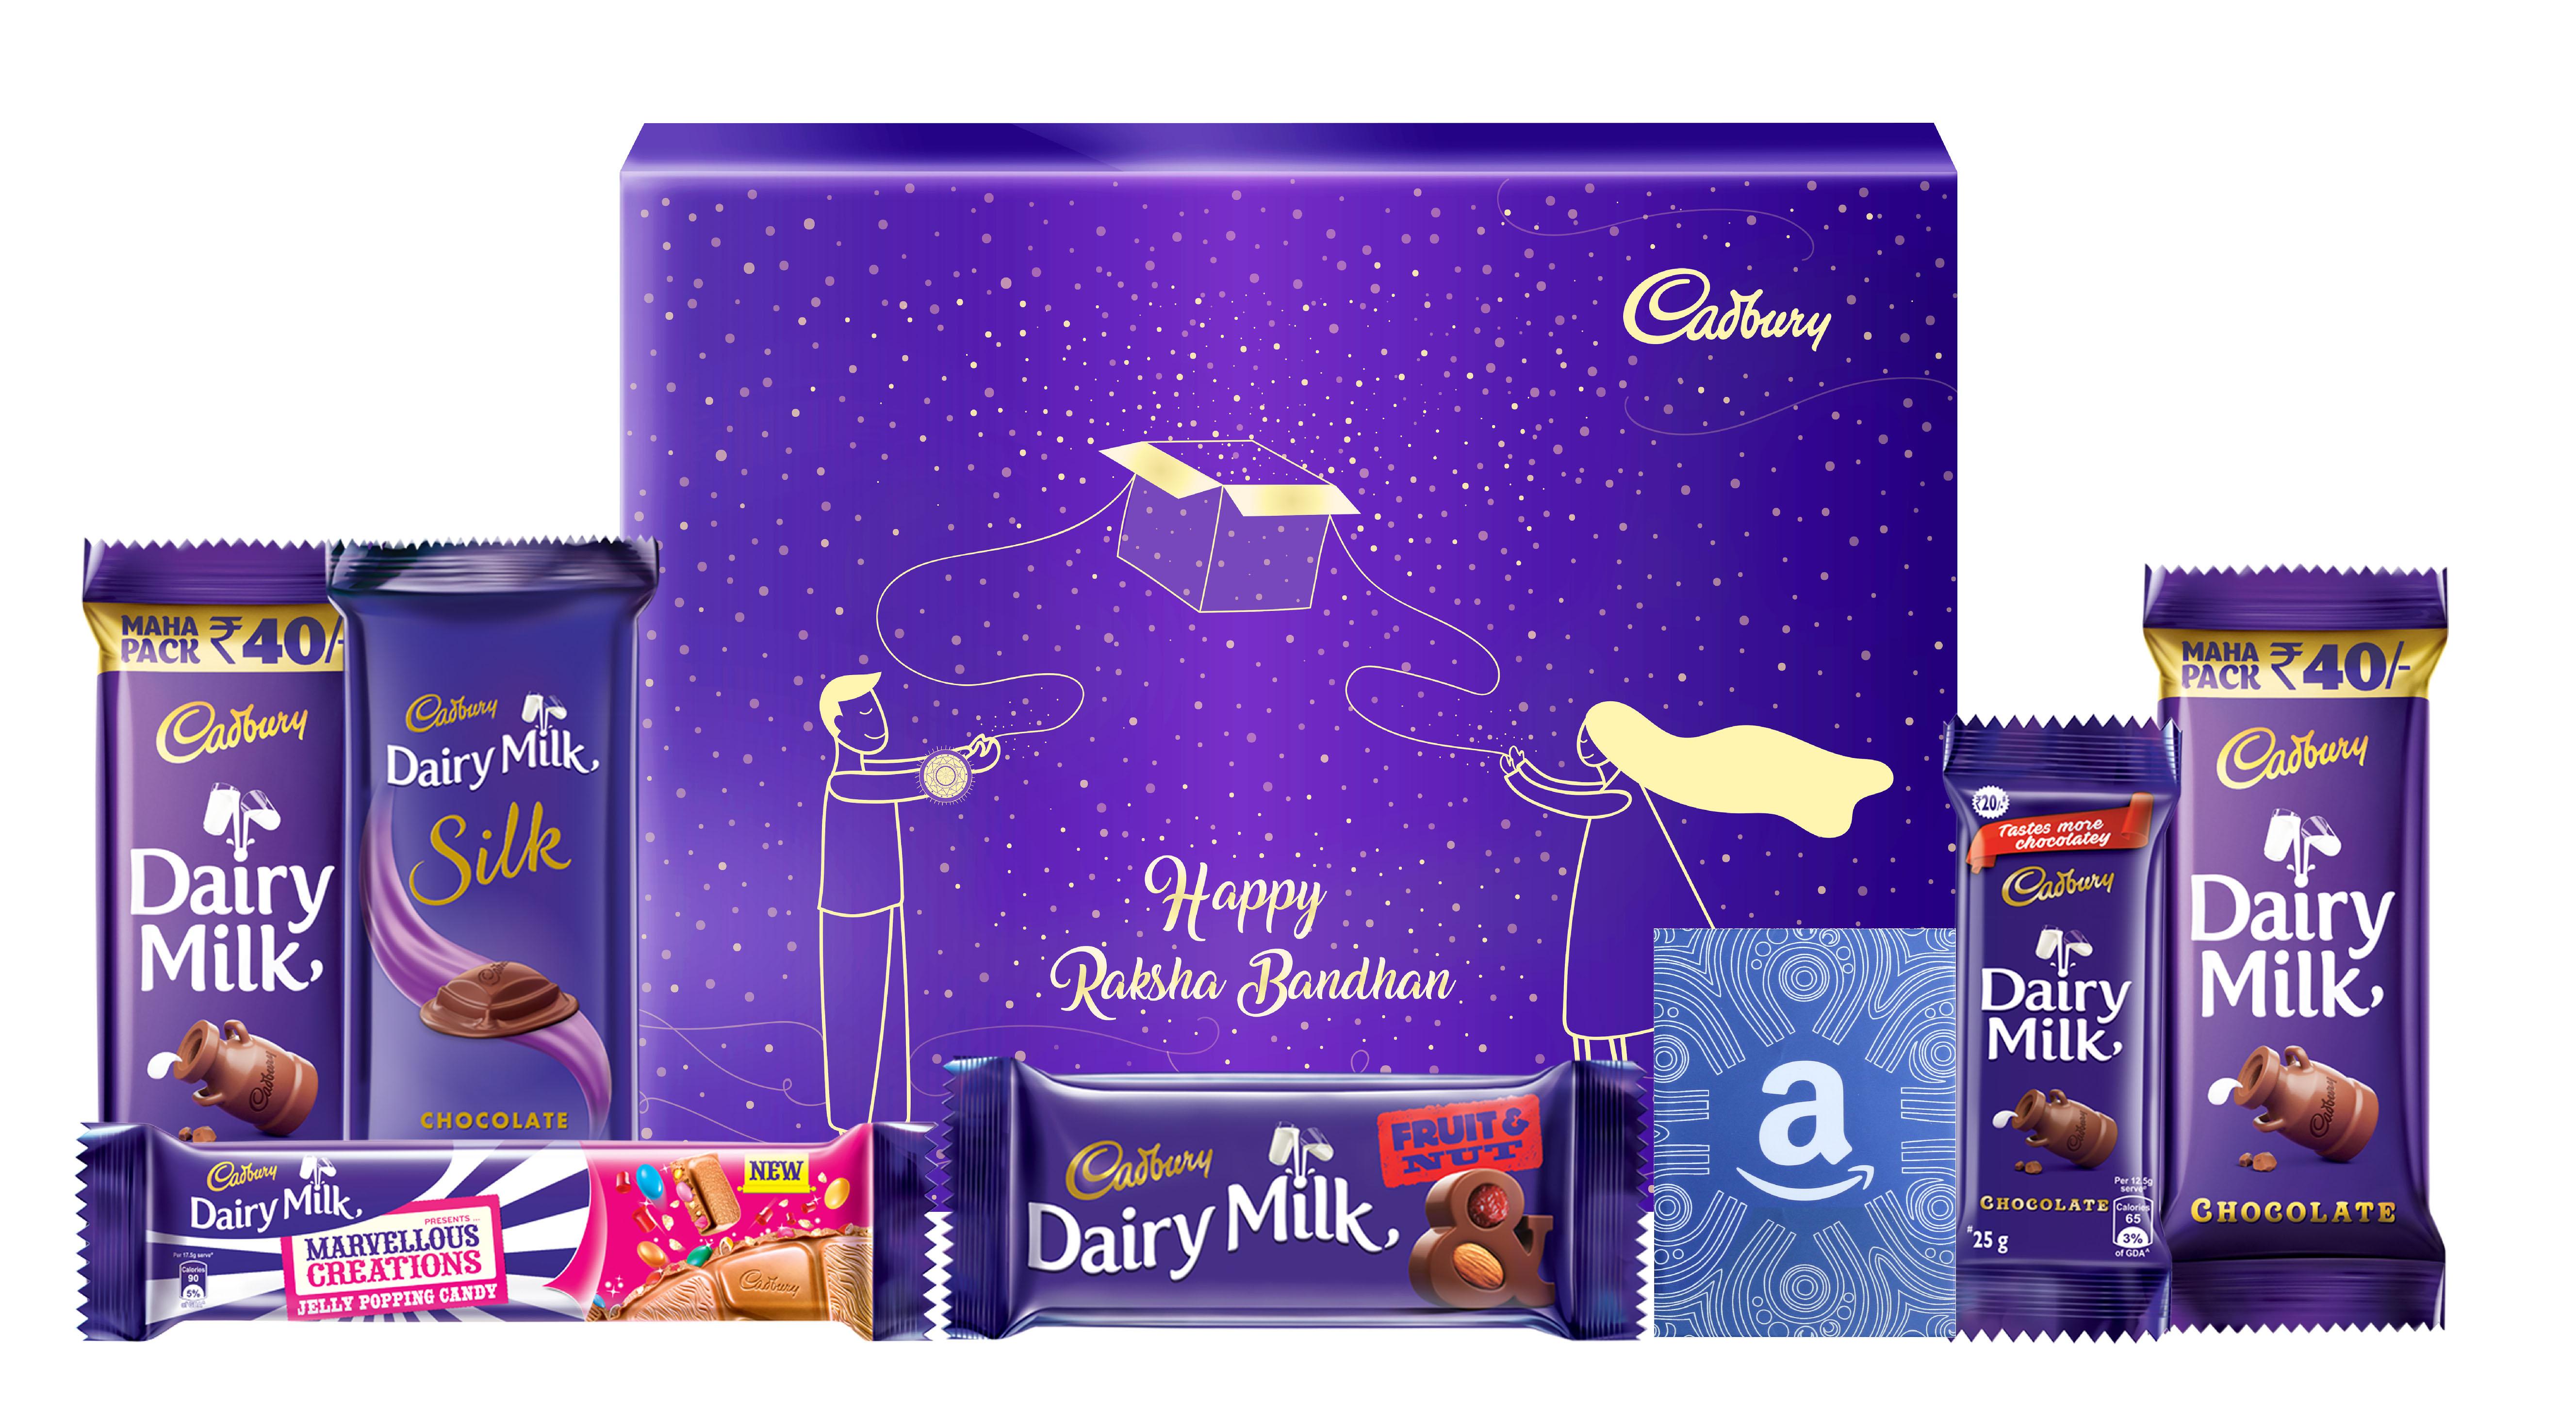 Festival Chocolate Gift Packaging Set - Cadbury